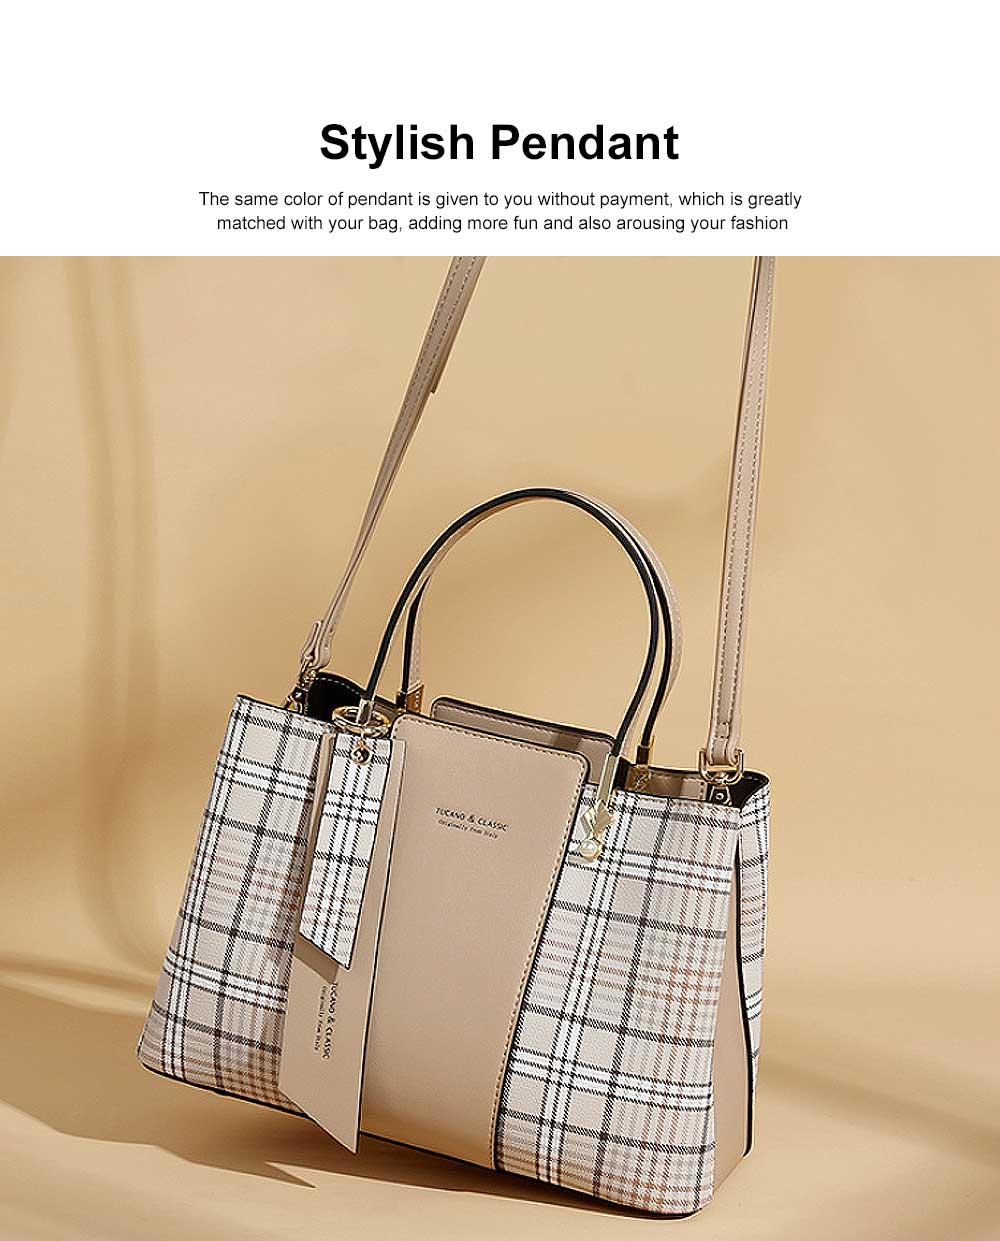 New Women Elegant Handbag Stylish Color Checkered Cloth Joint Spacious Shoulder Bag 2